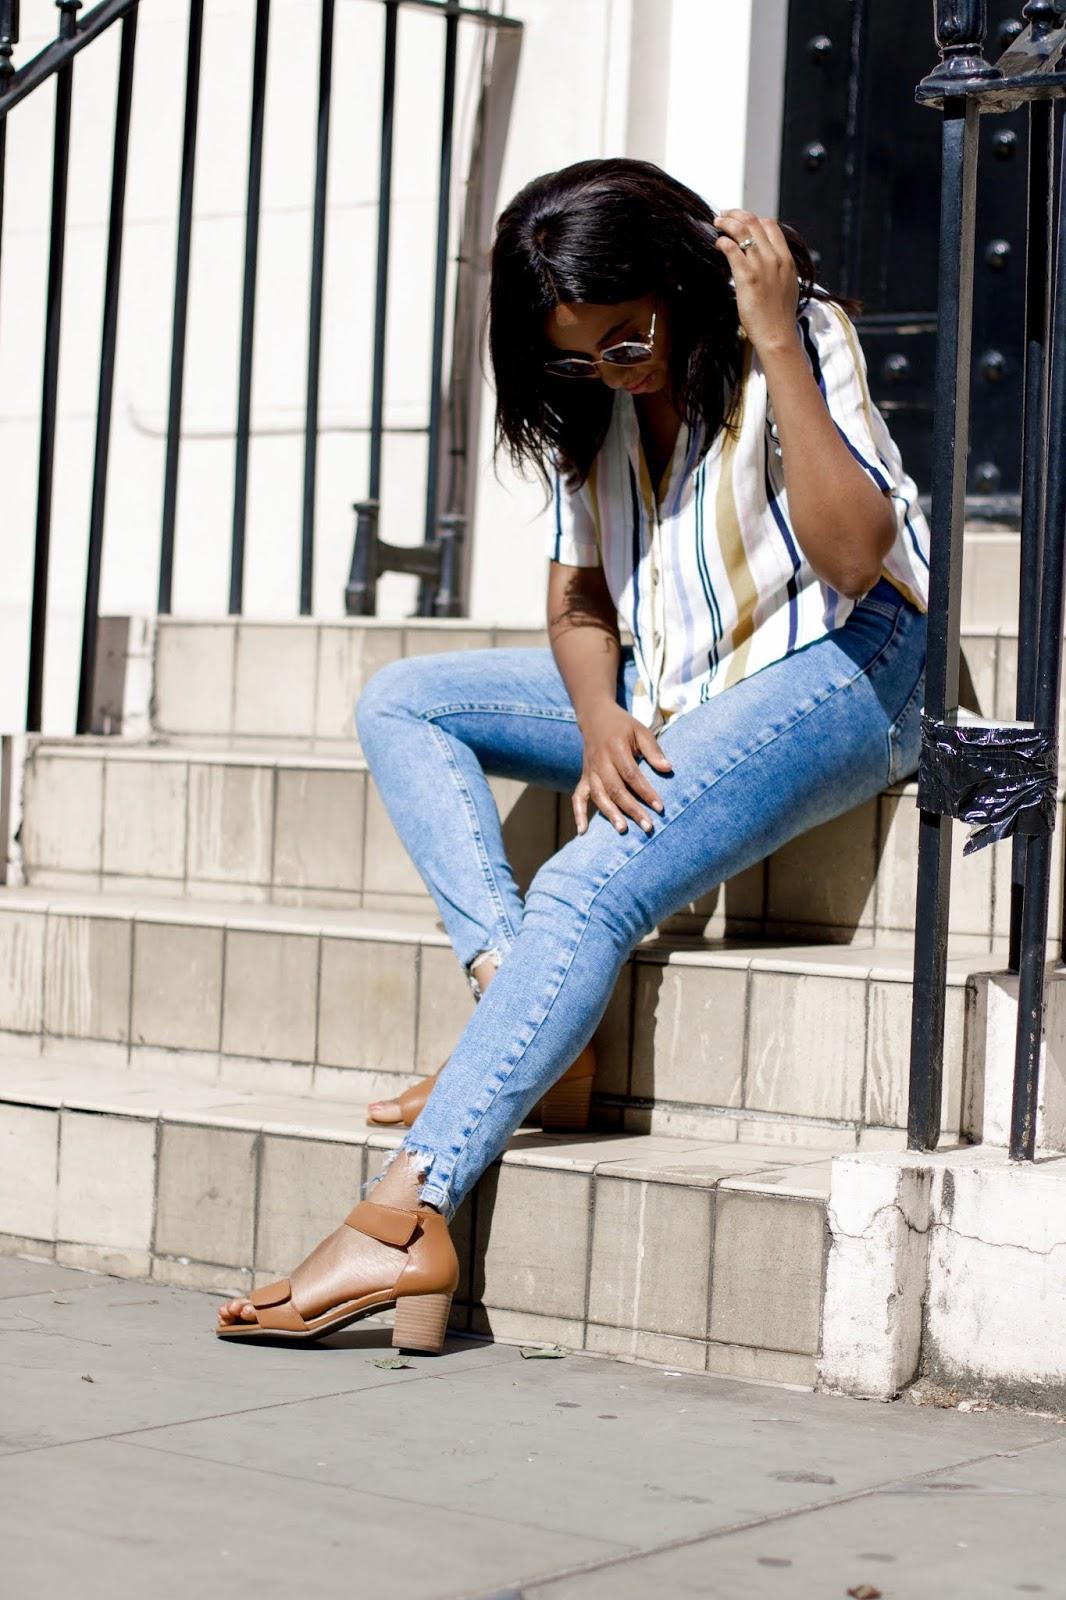 New Look Hallie Jeans